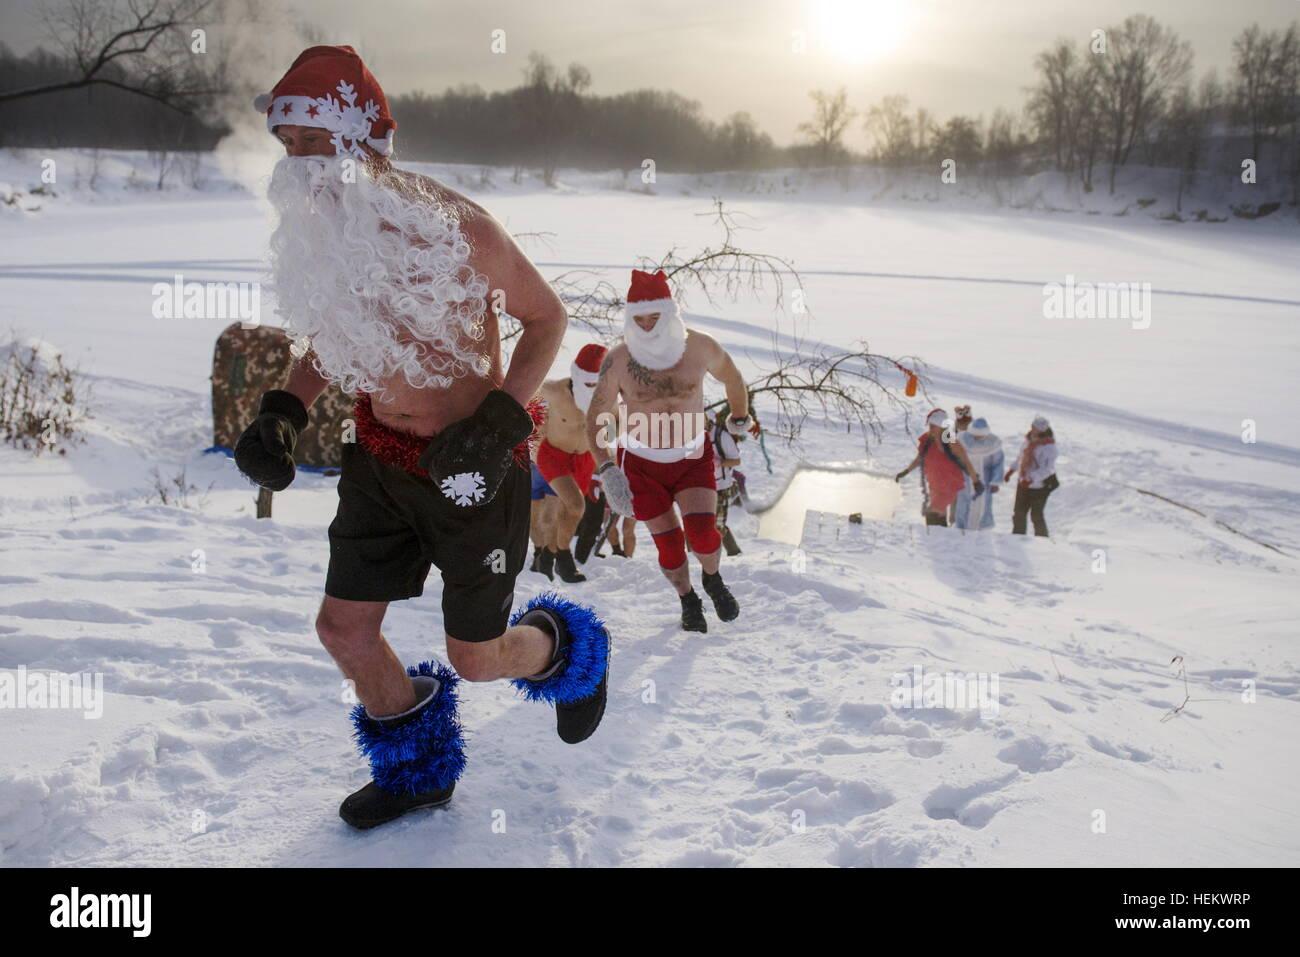 Novosibirsk, Russia  24th Dec, 2016  Members of a winter swimming